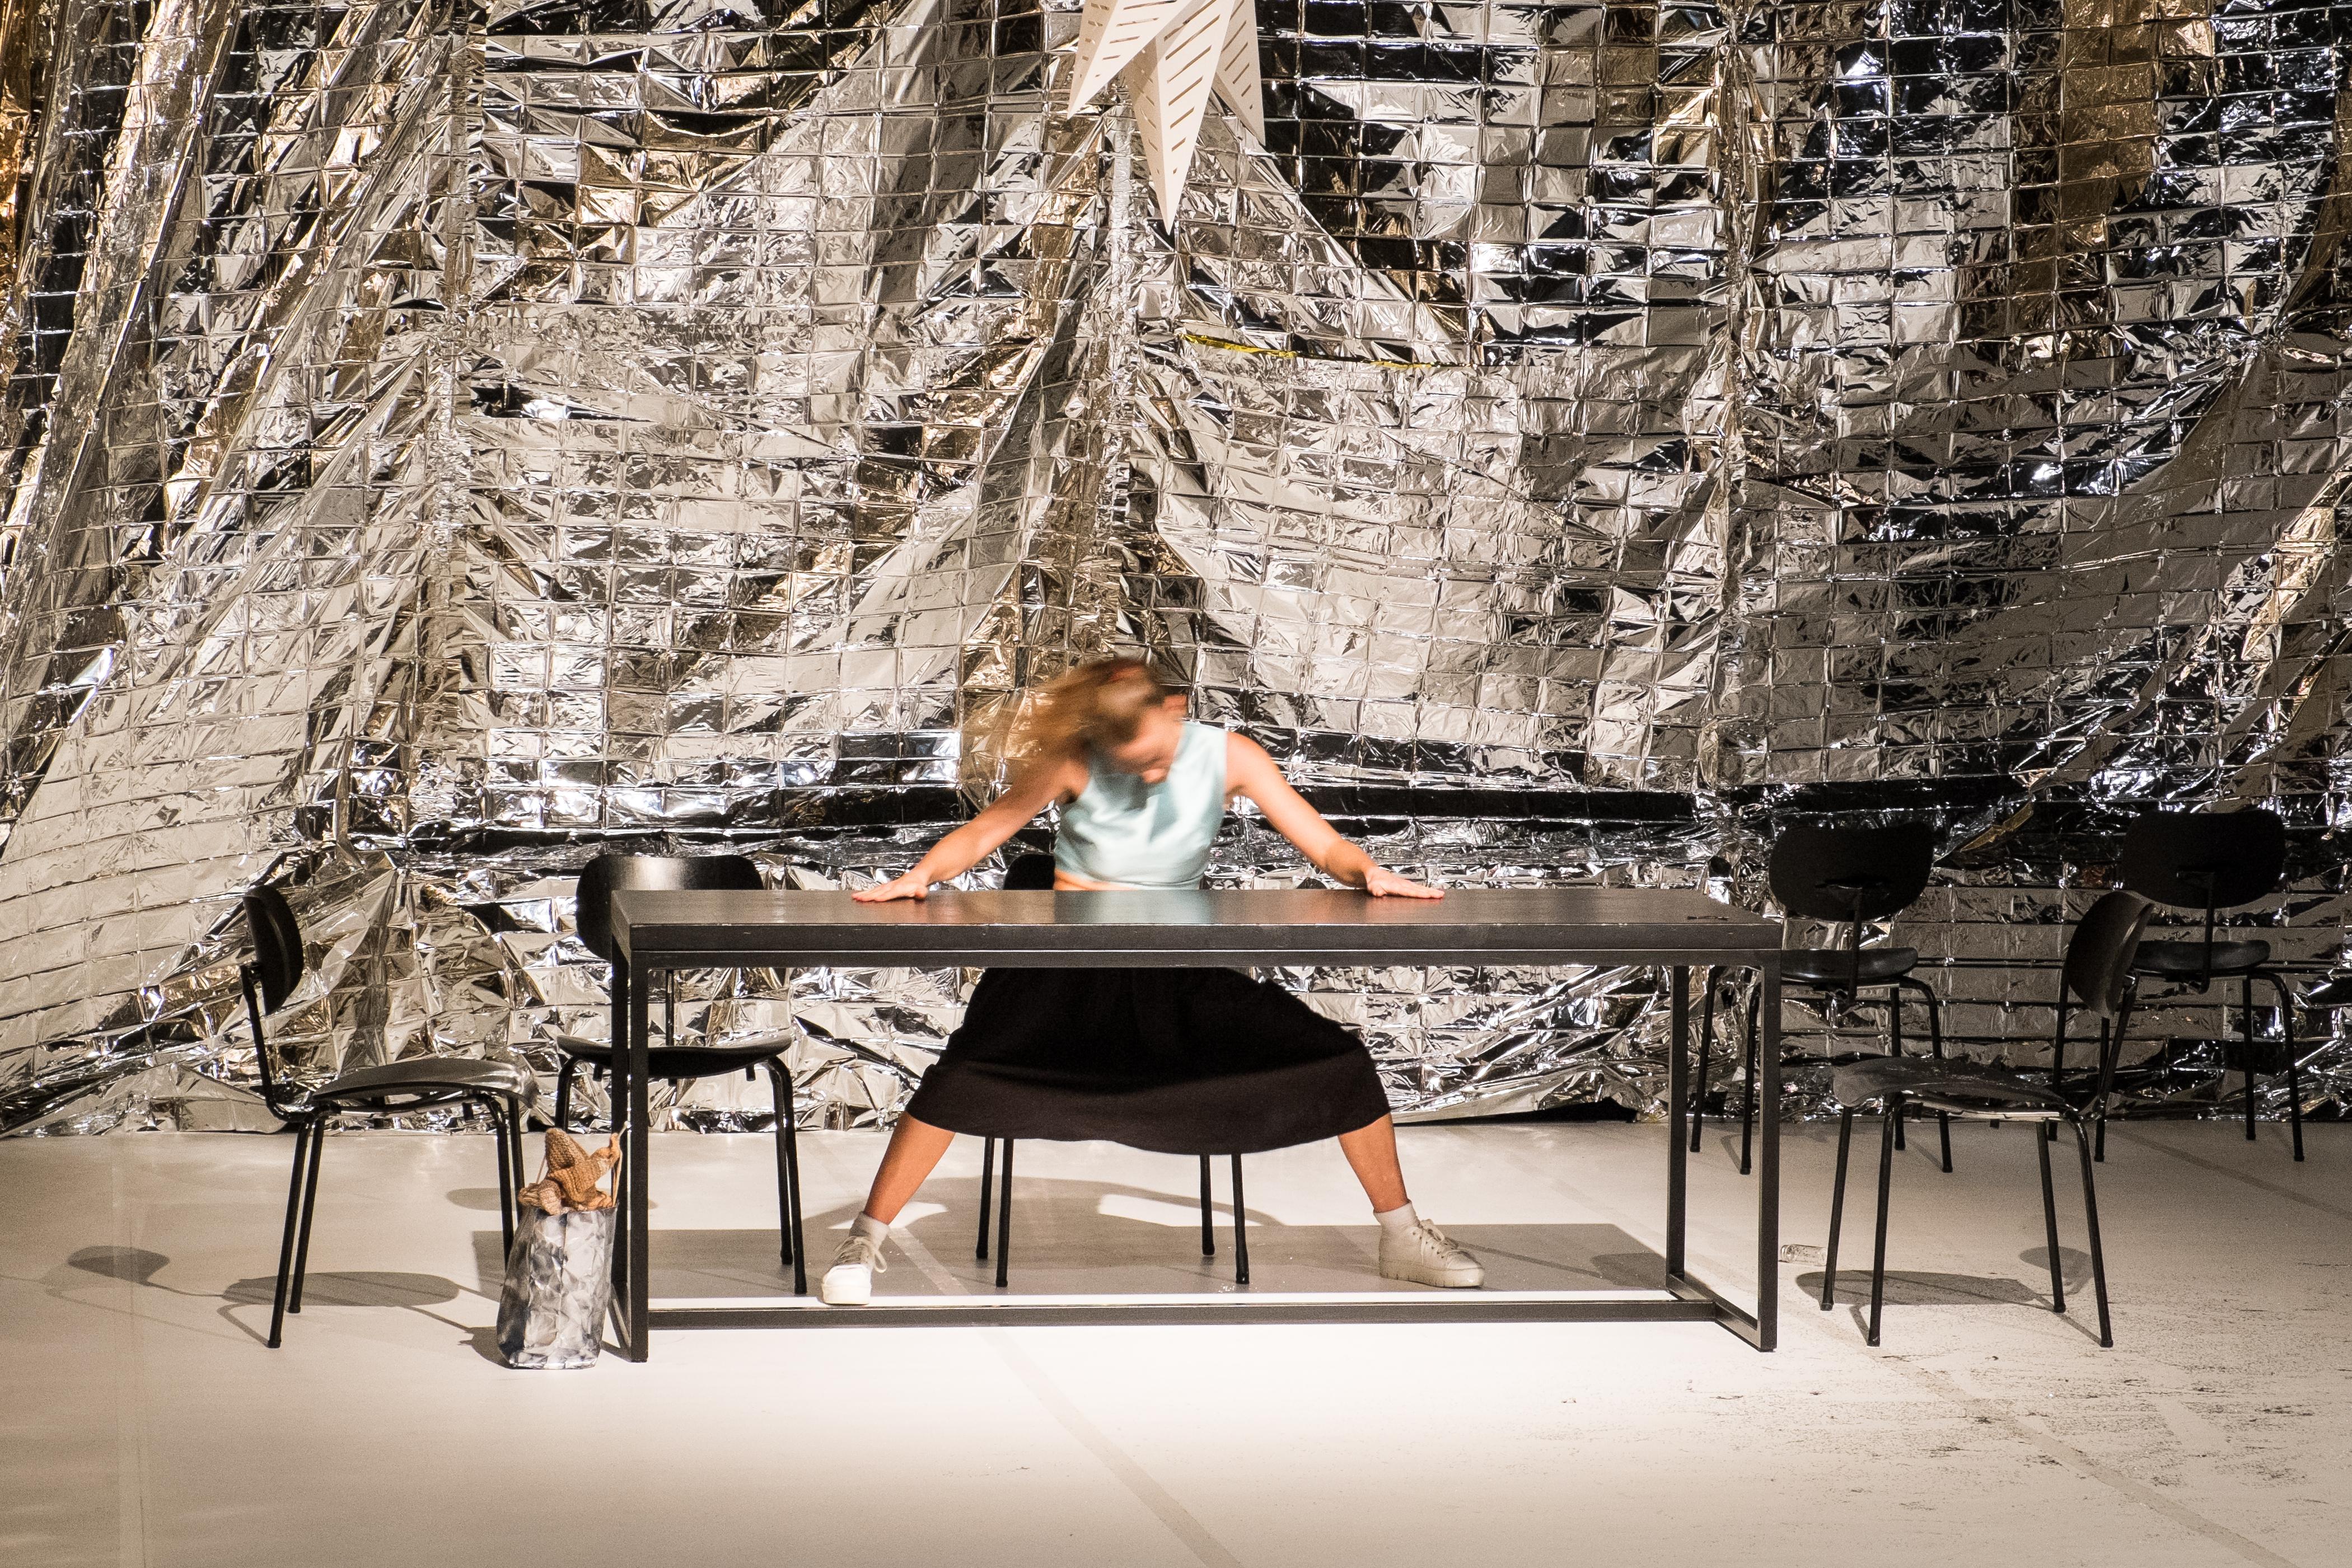 syndikat-visuell.de-Nutkracker:Theatre National, Luxemburg 3